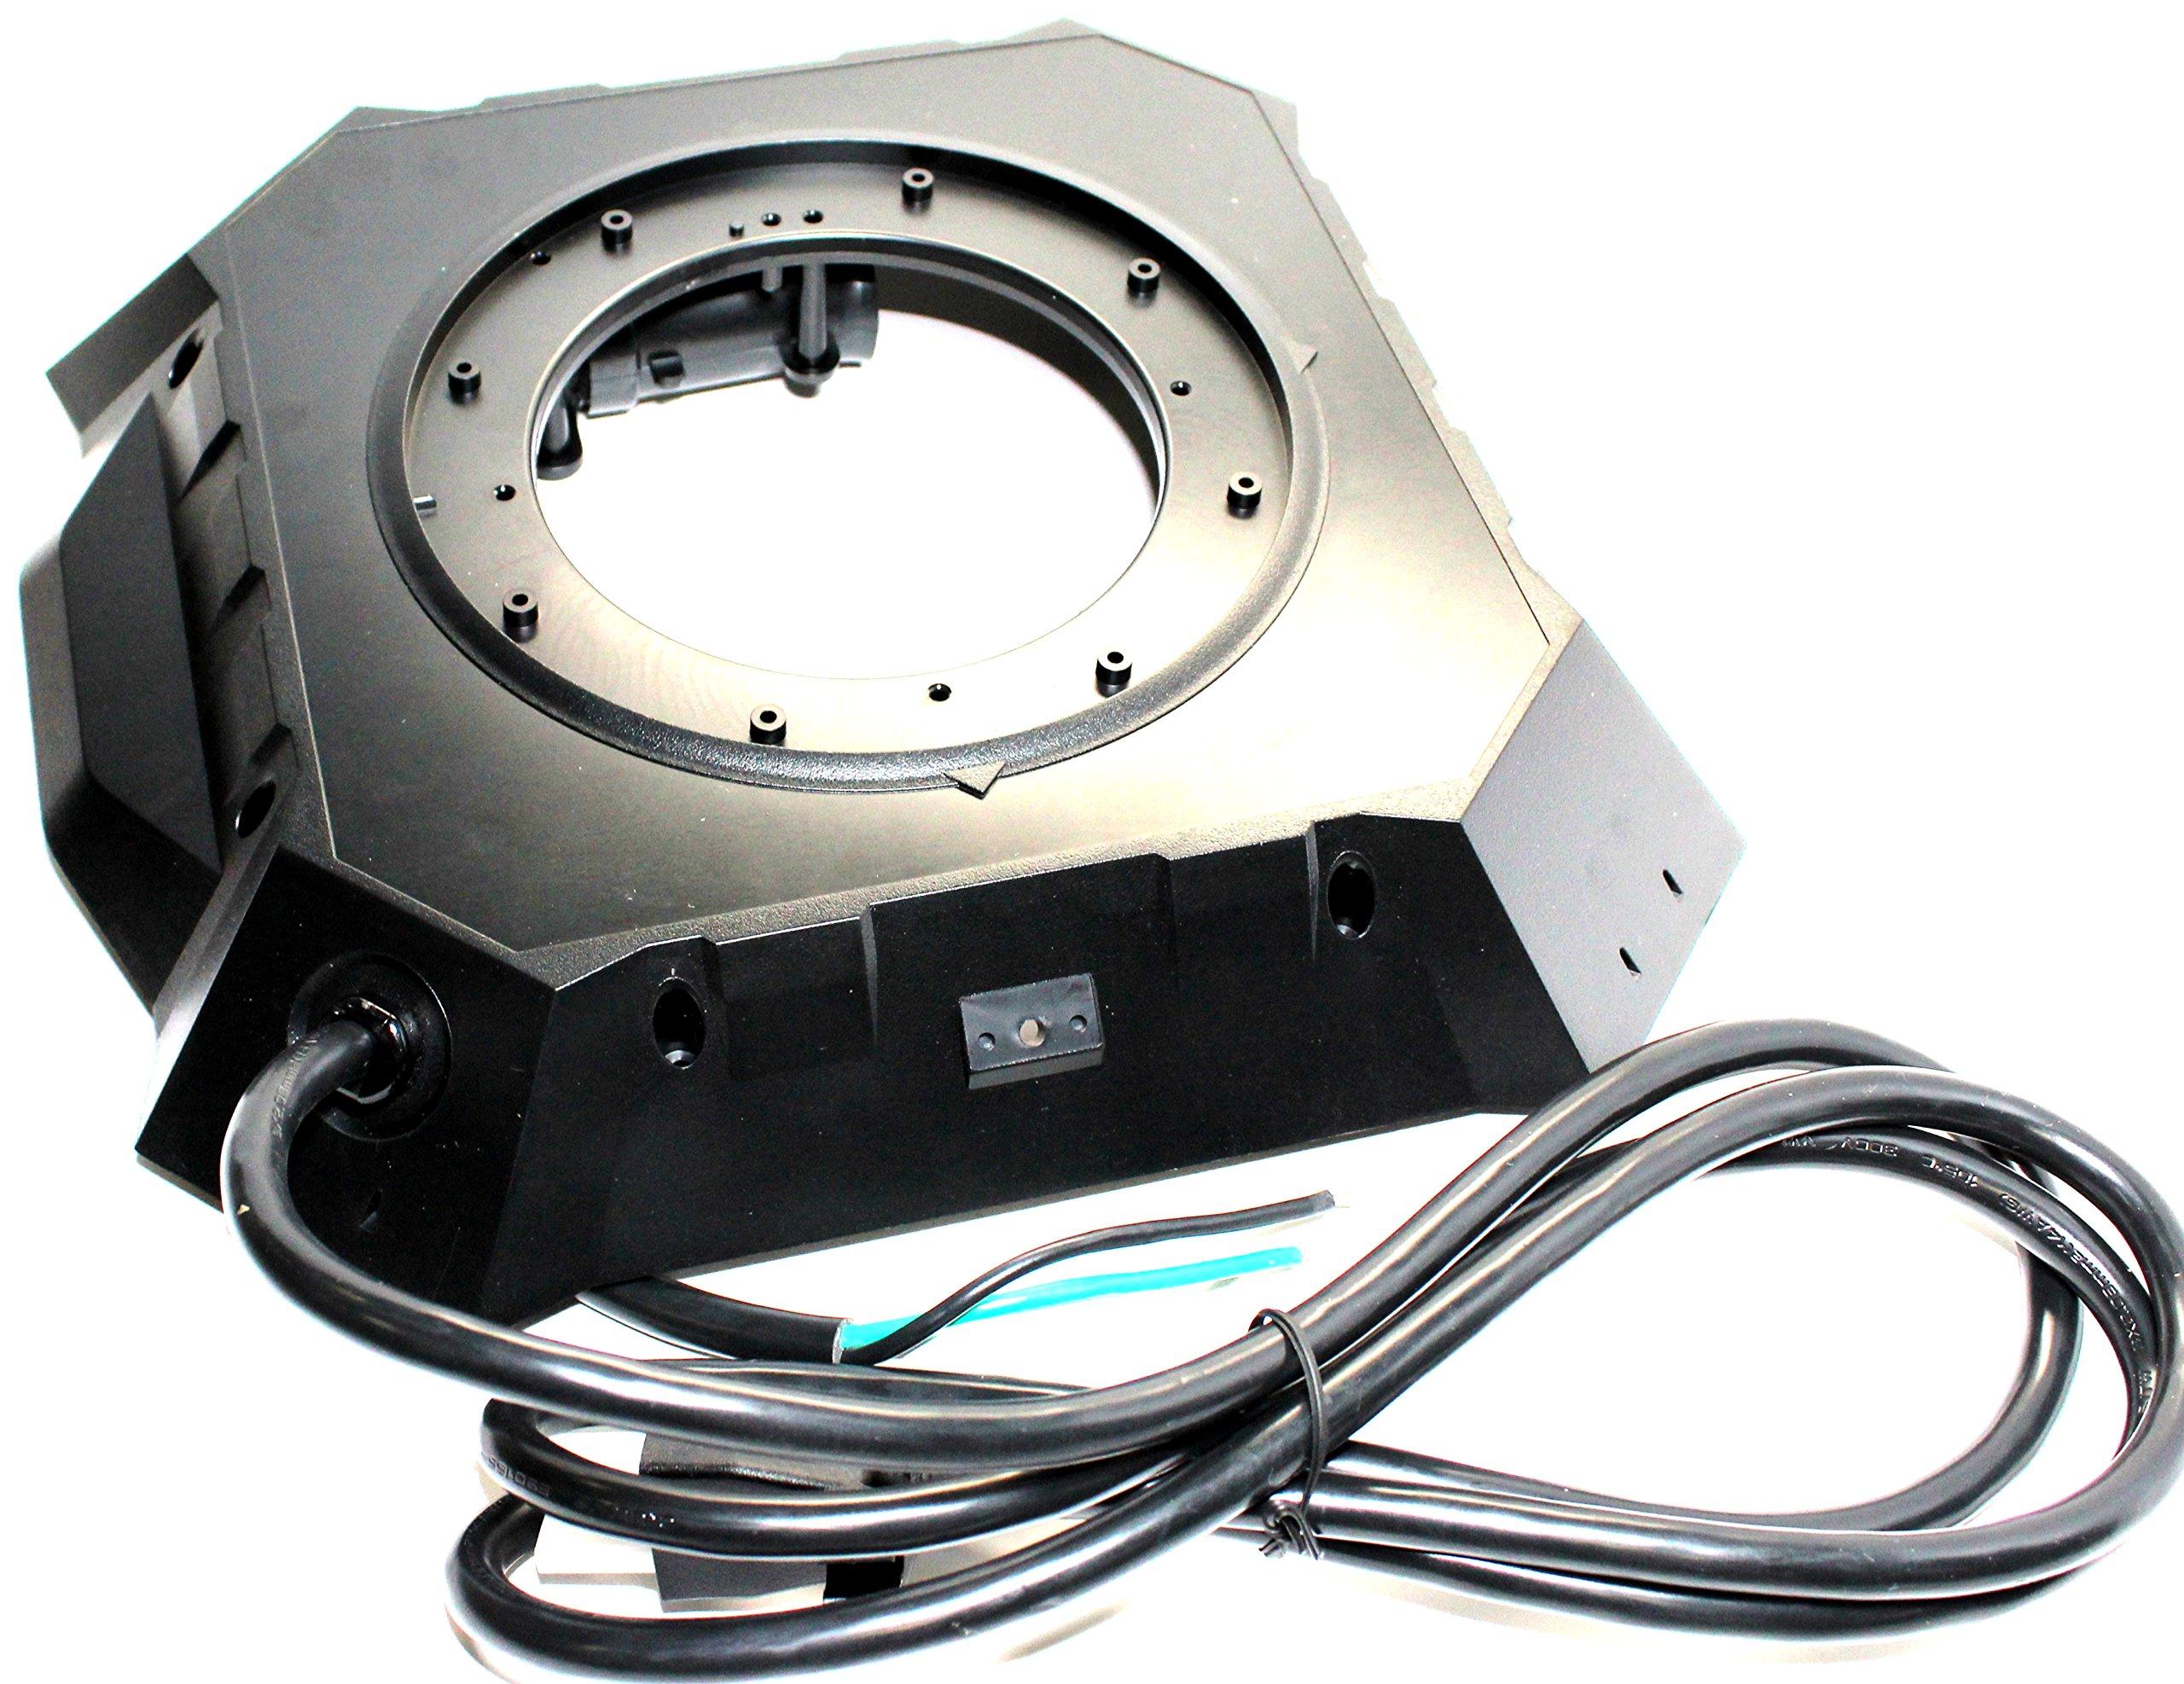 Bosch Parts 2610008353 USA/Canada Bottom Housing Assembly